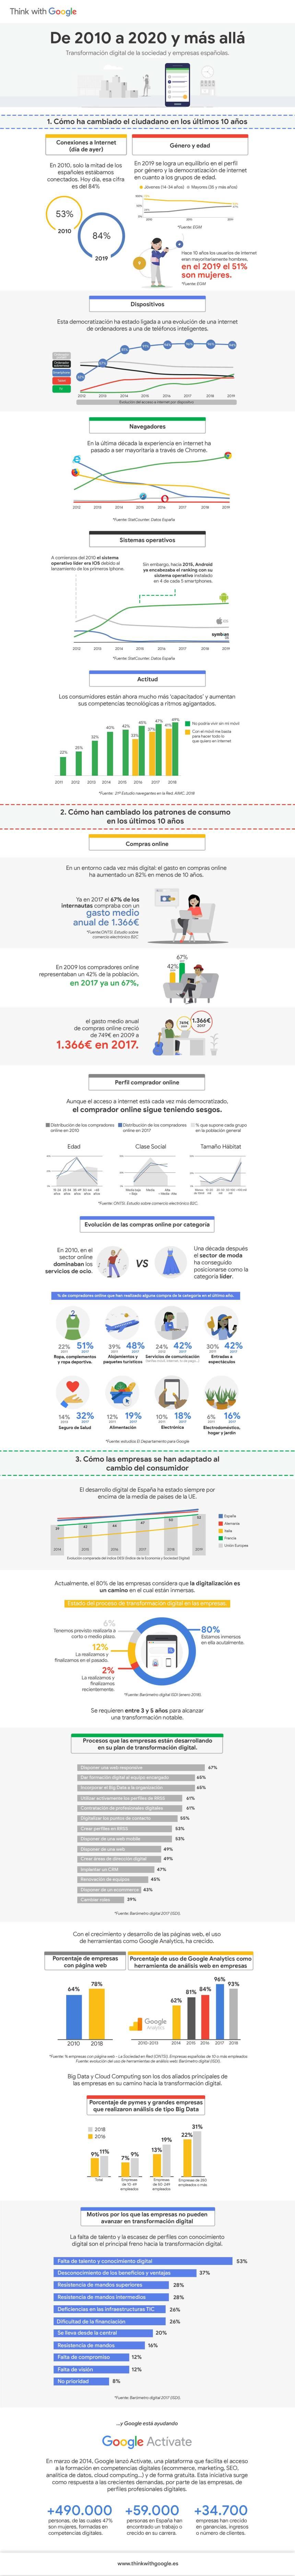 Transformación digital en España 2010-2020